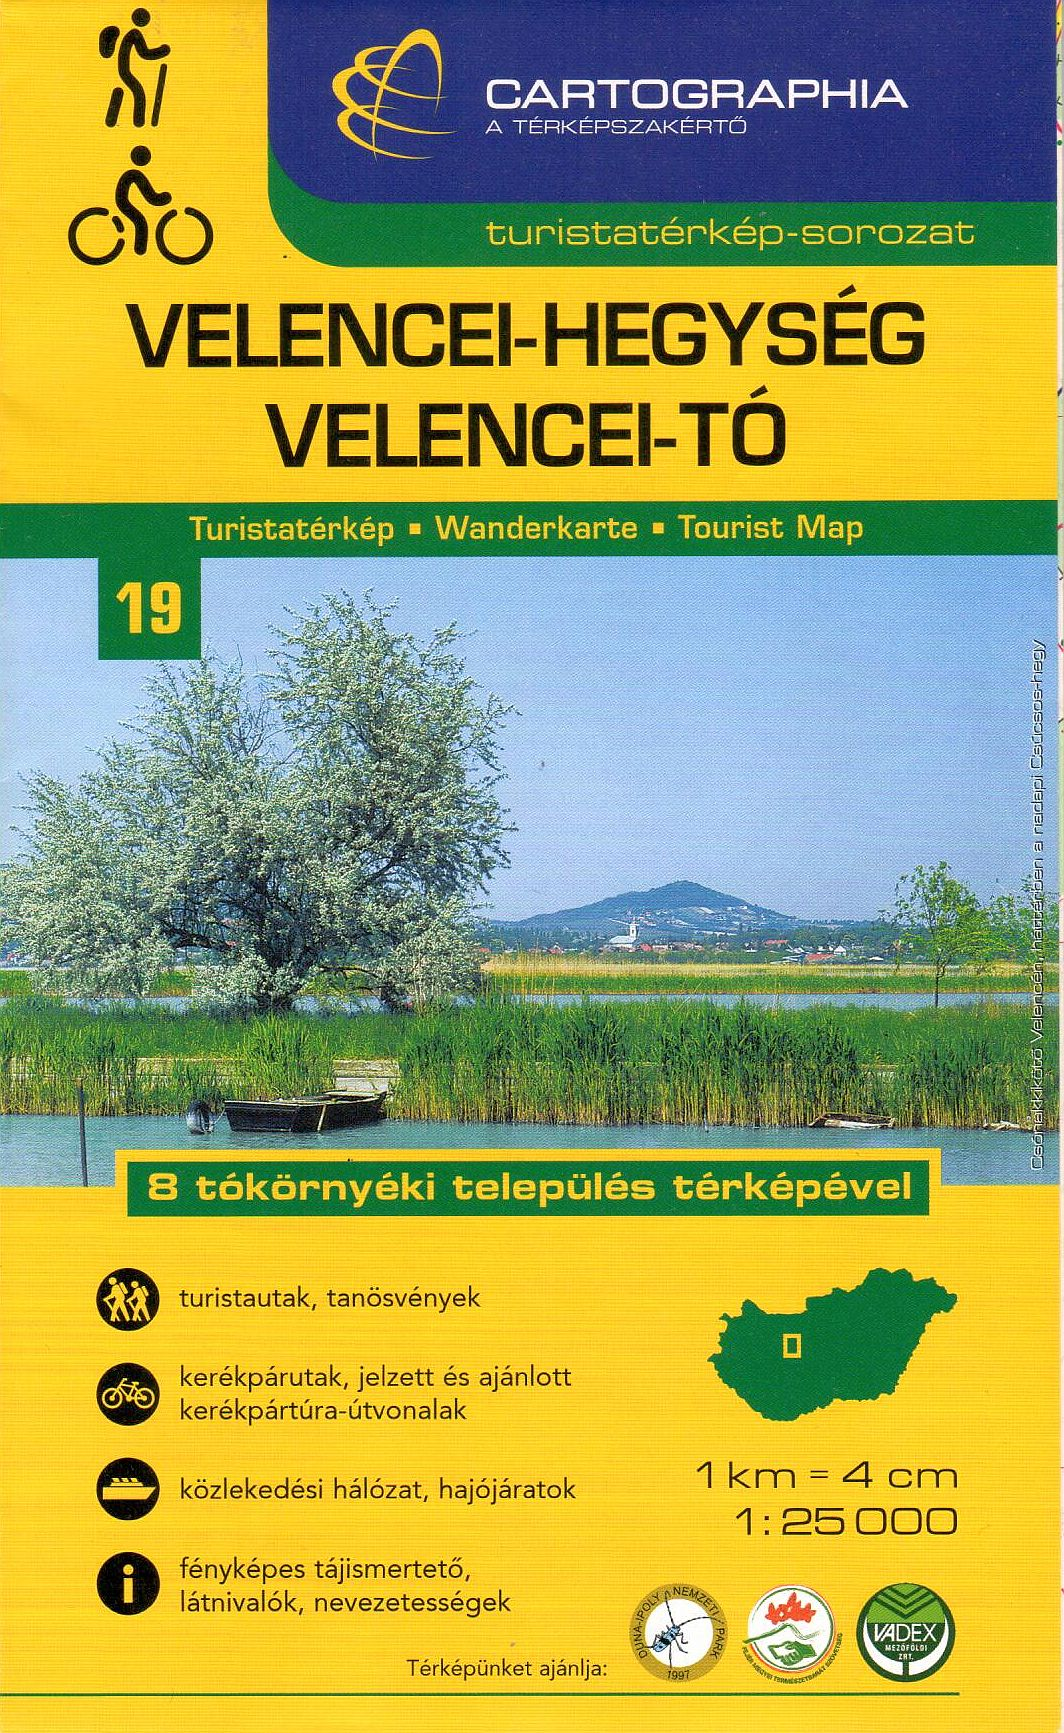 Velence hills and Velence lake watersport, hiking and biking map